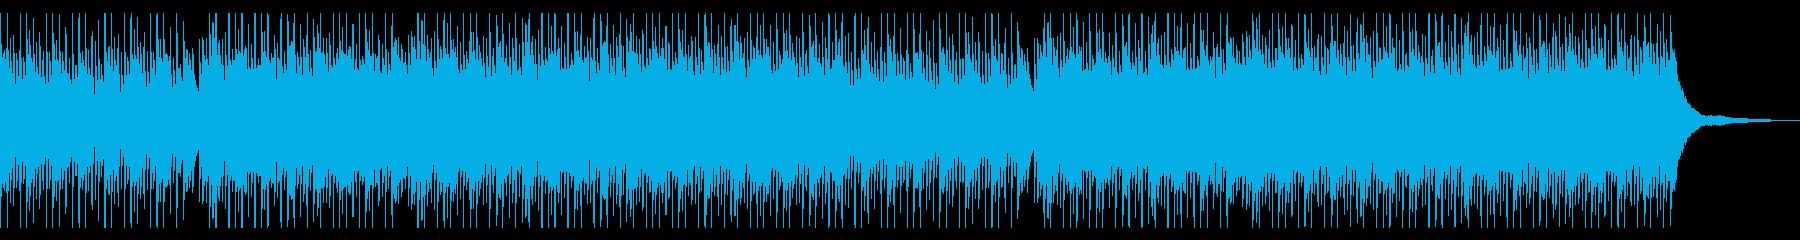 No strings Piano Spark Exhilarating's reproduced waveform